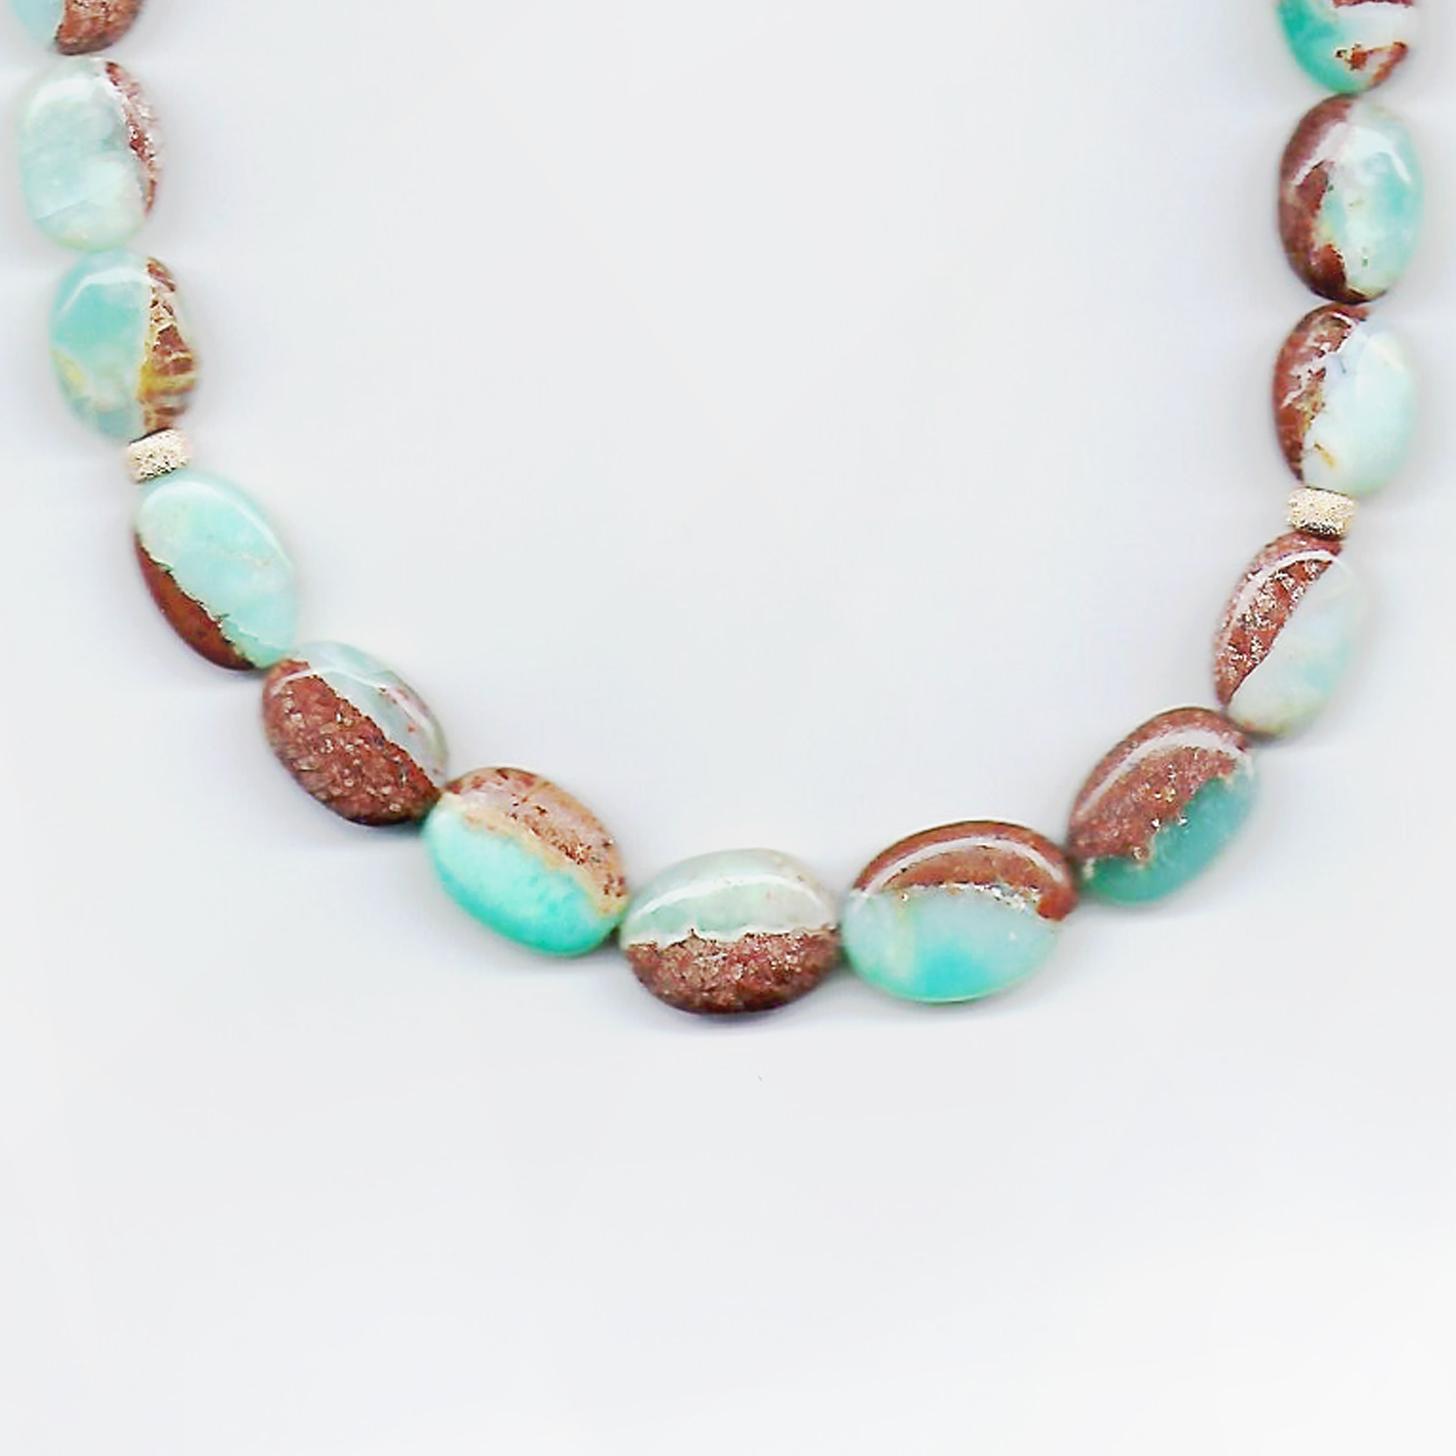 Collier mit Opal, grün-braun, glatt,  ca. 190 ct, ca. 45 cm, Edelstein echt, Karabinerverschluss, 585 Gelbgold Terra Opalis